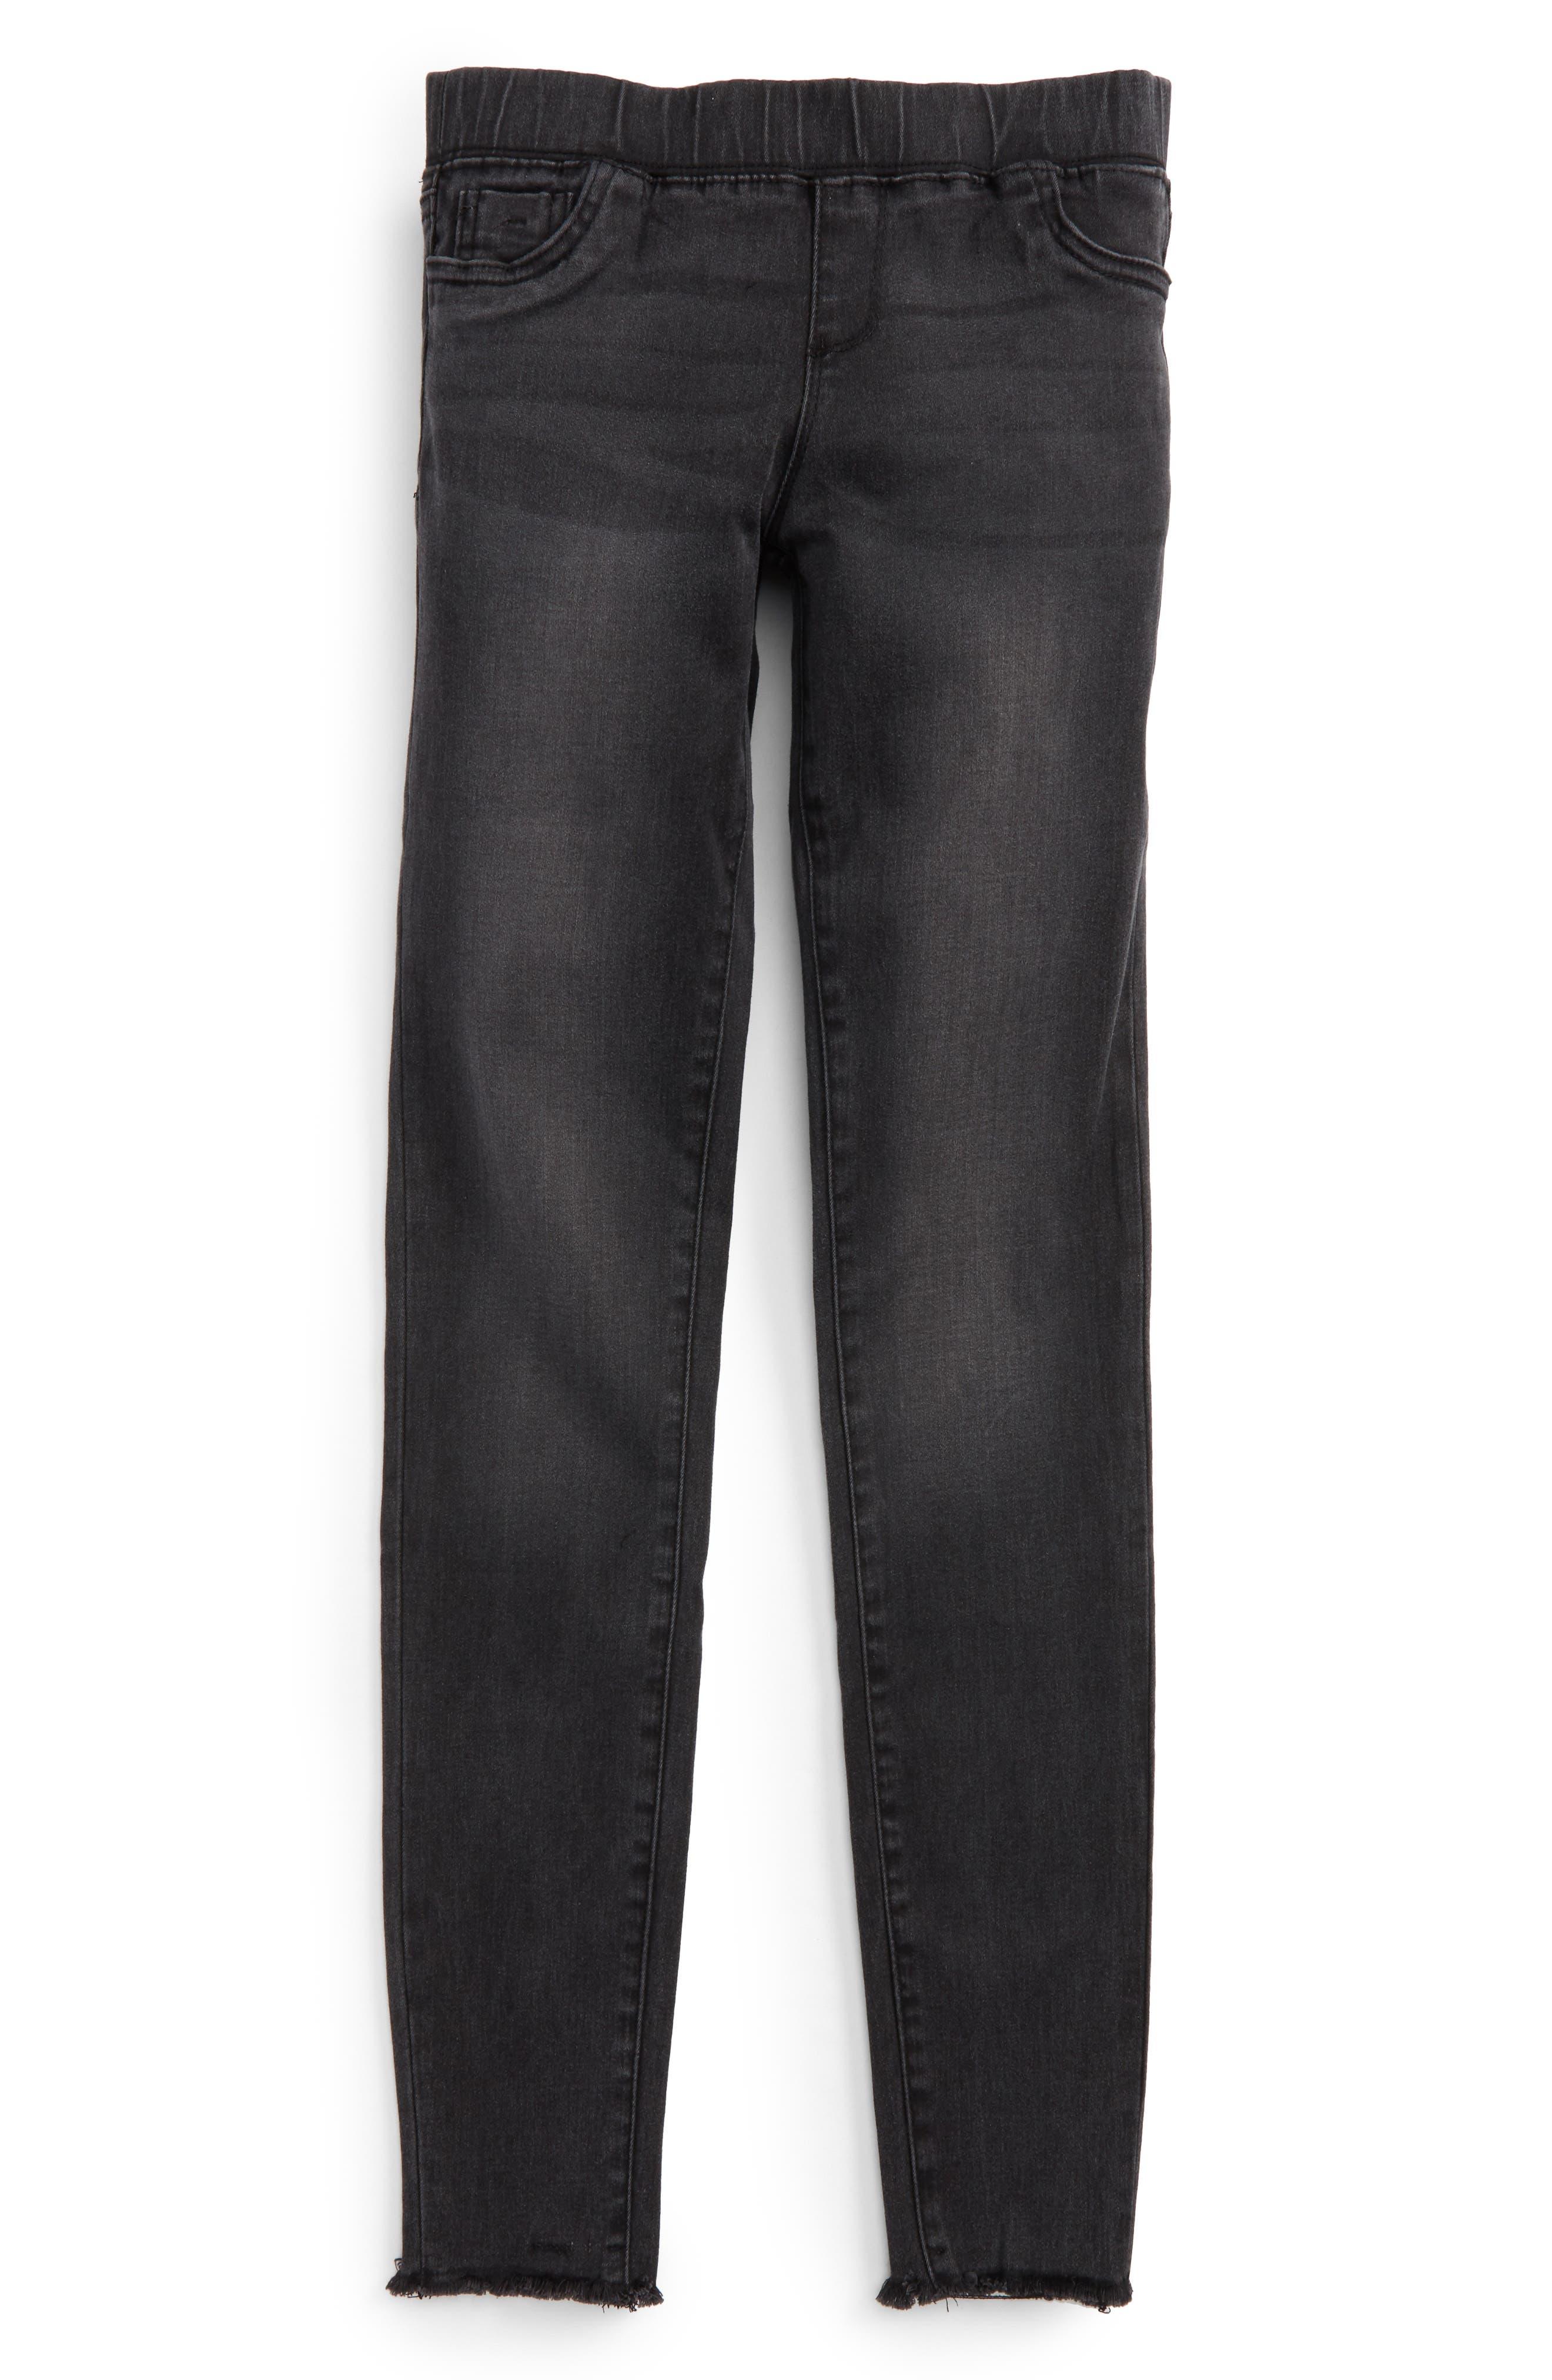 Tractr Frayed Denim Pants (Big Girls)